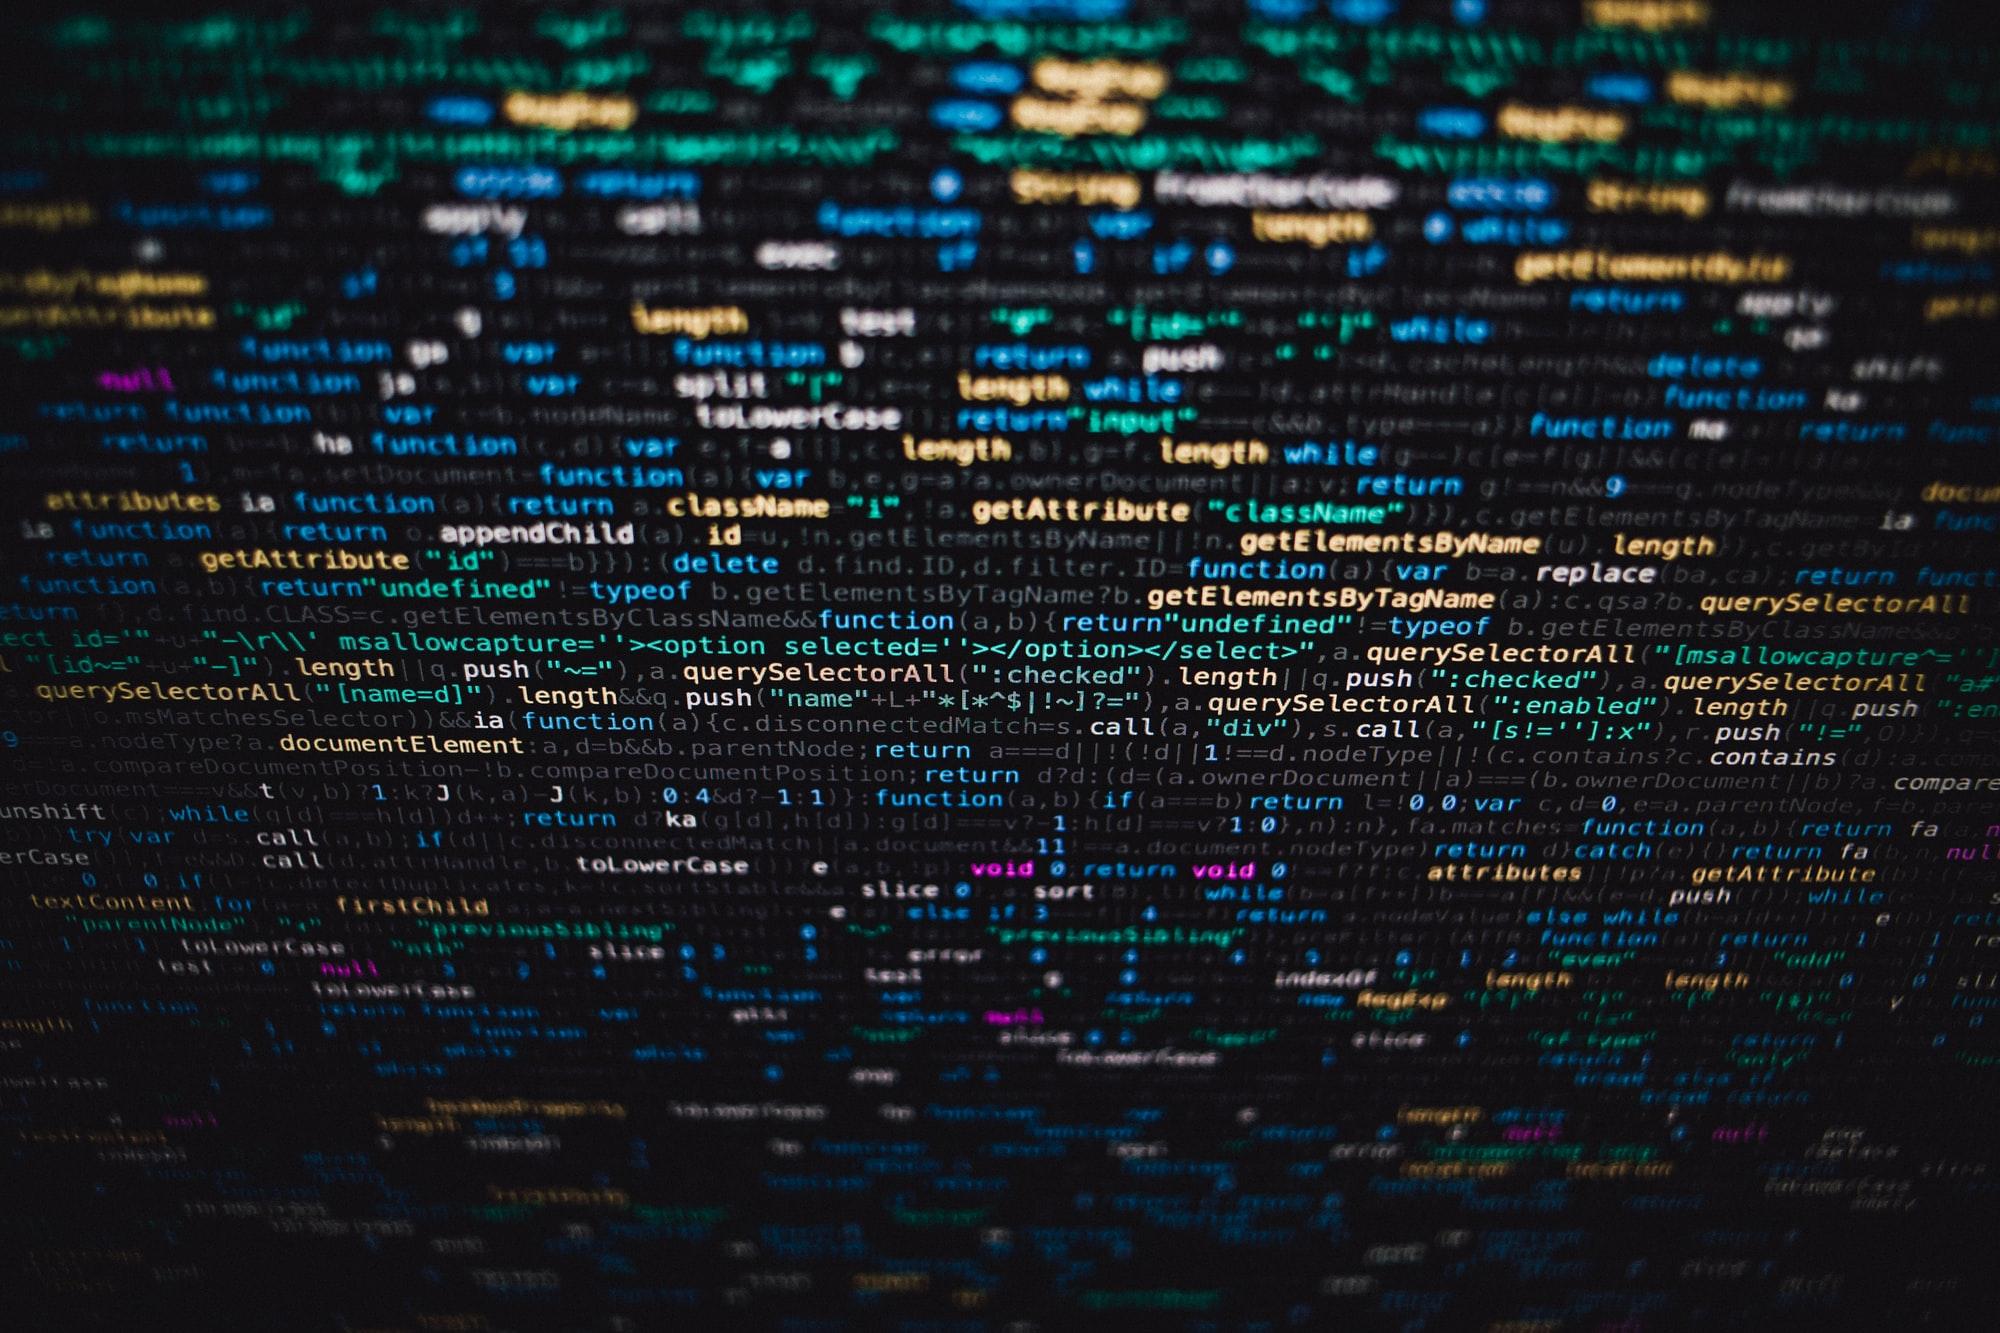 General 2000x1333 JavaScript tilt shift depth of field programming language blurred monitor code